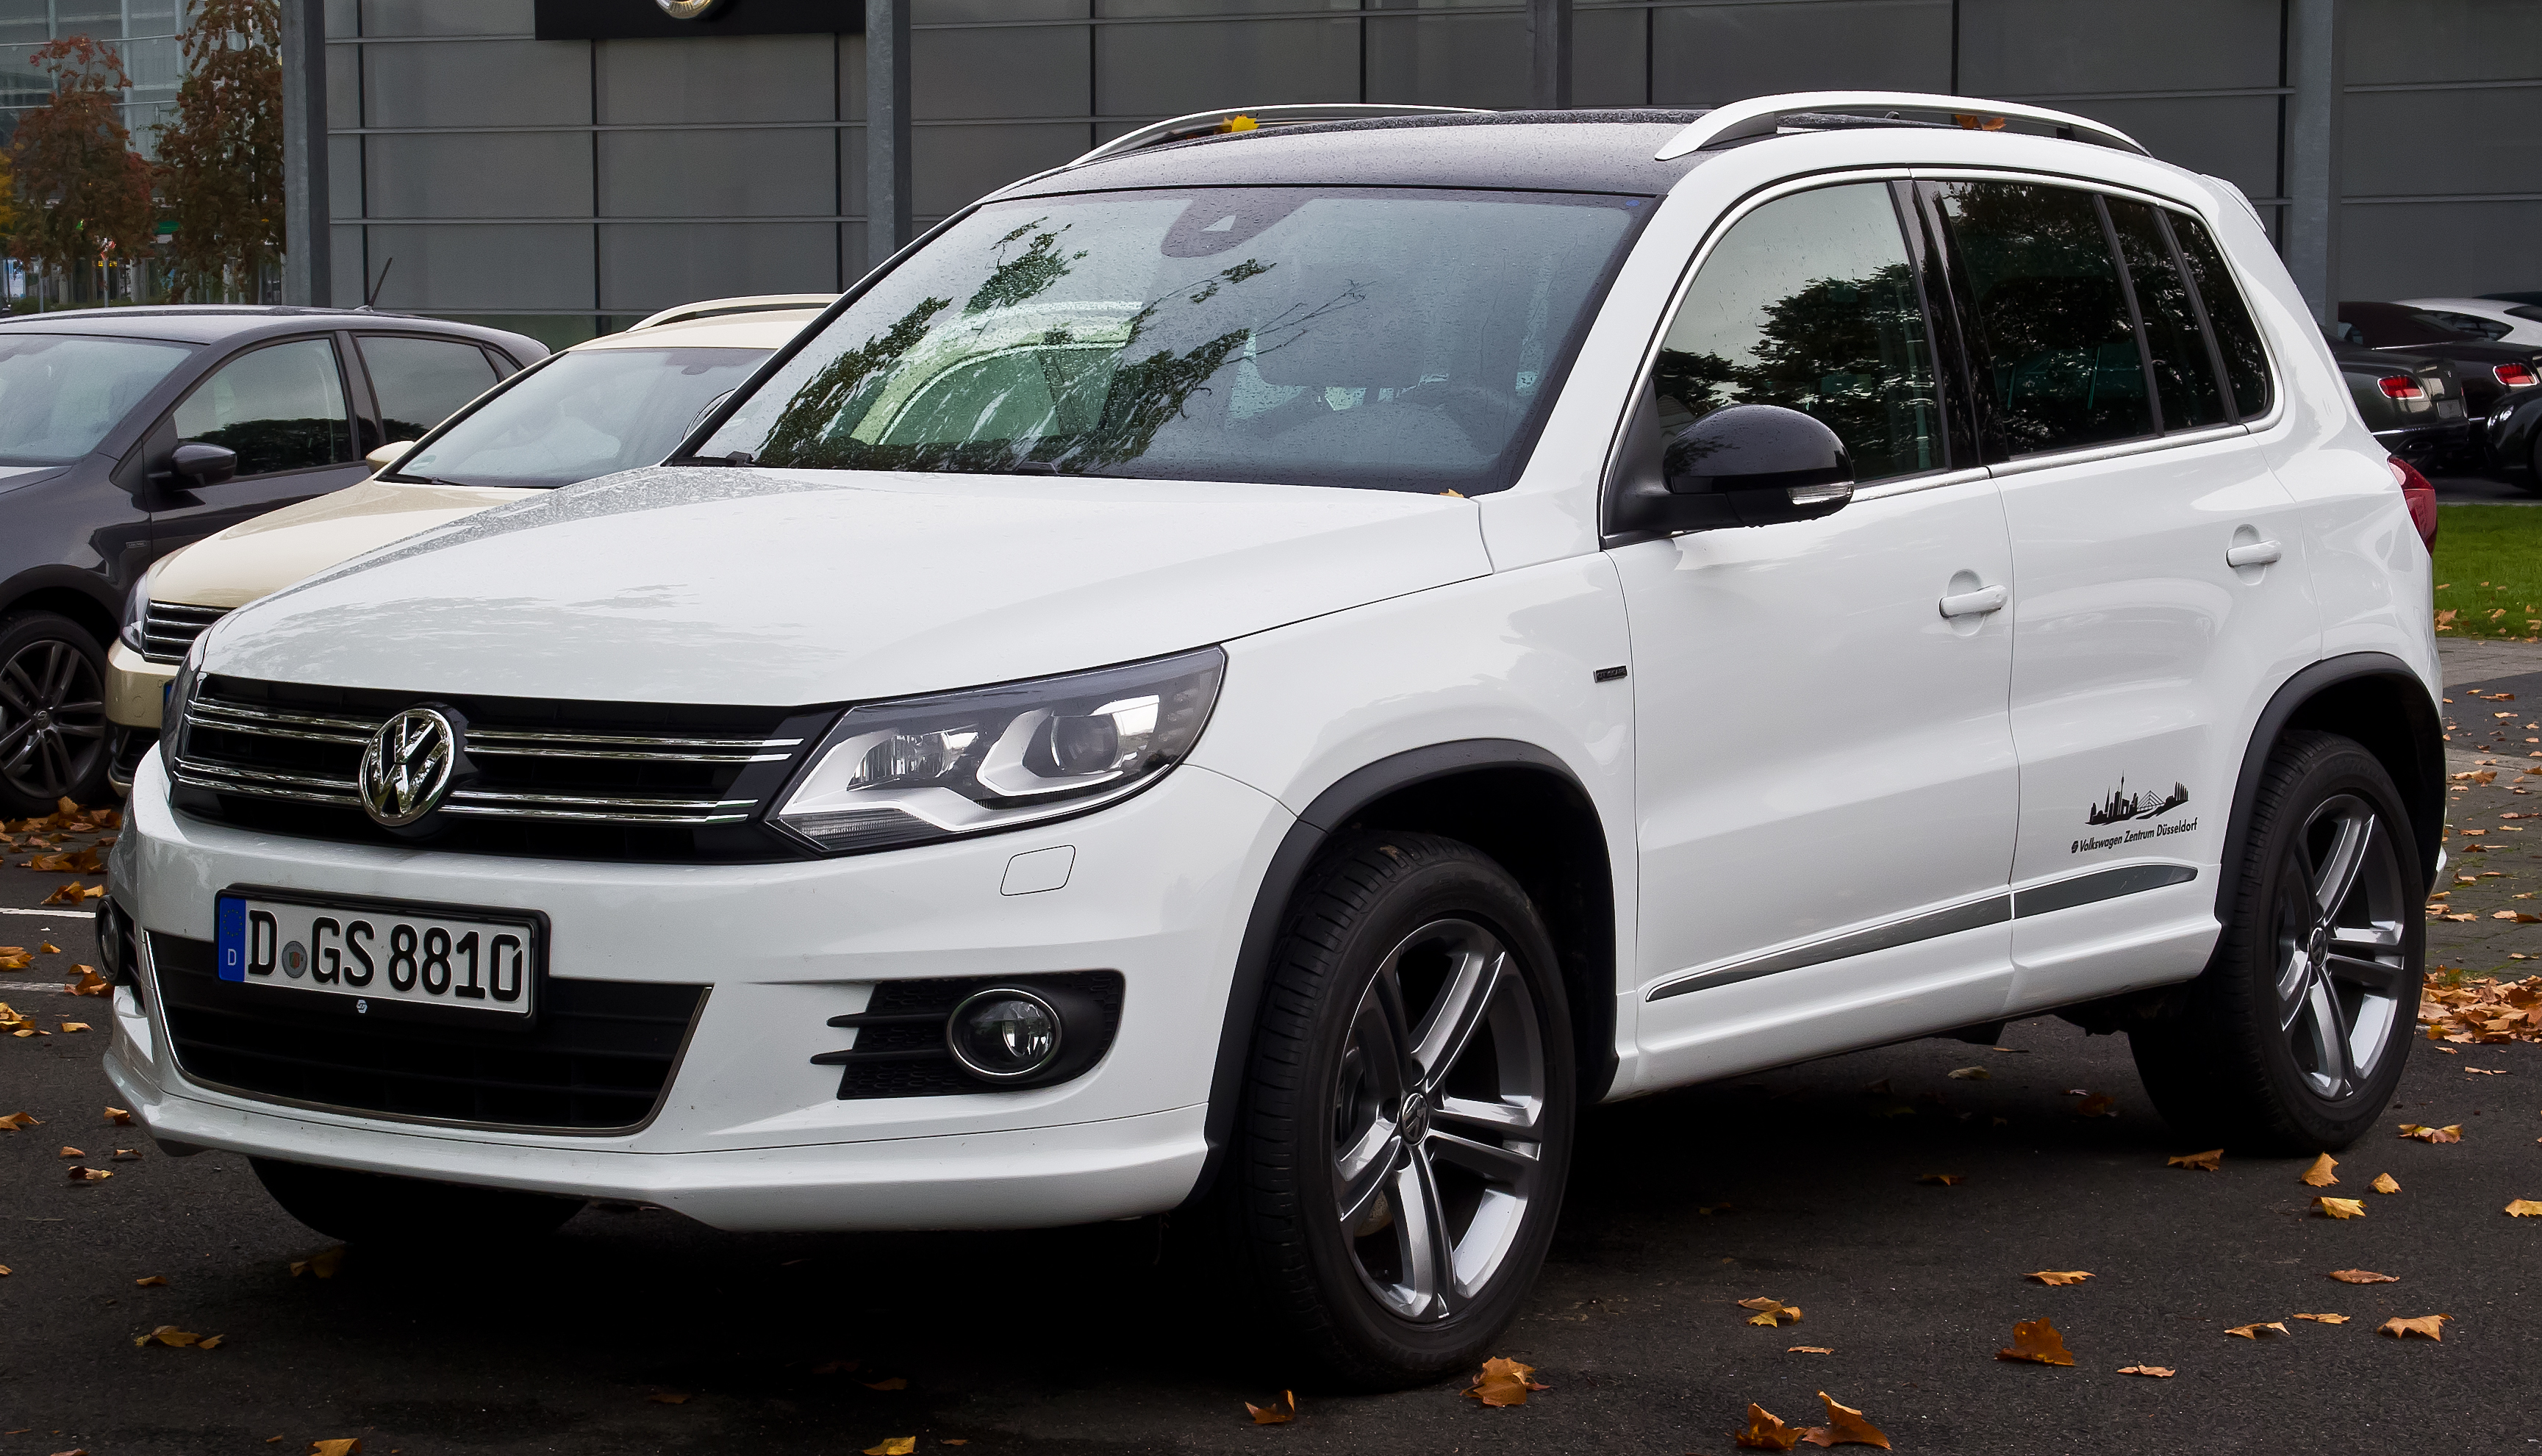 File:VW Tiguan 2.0 TDI 4MOTION CITYSCAPE (Facelift ...